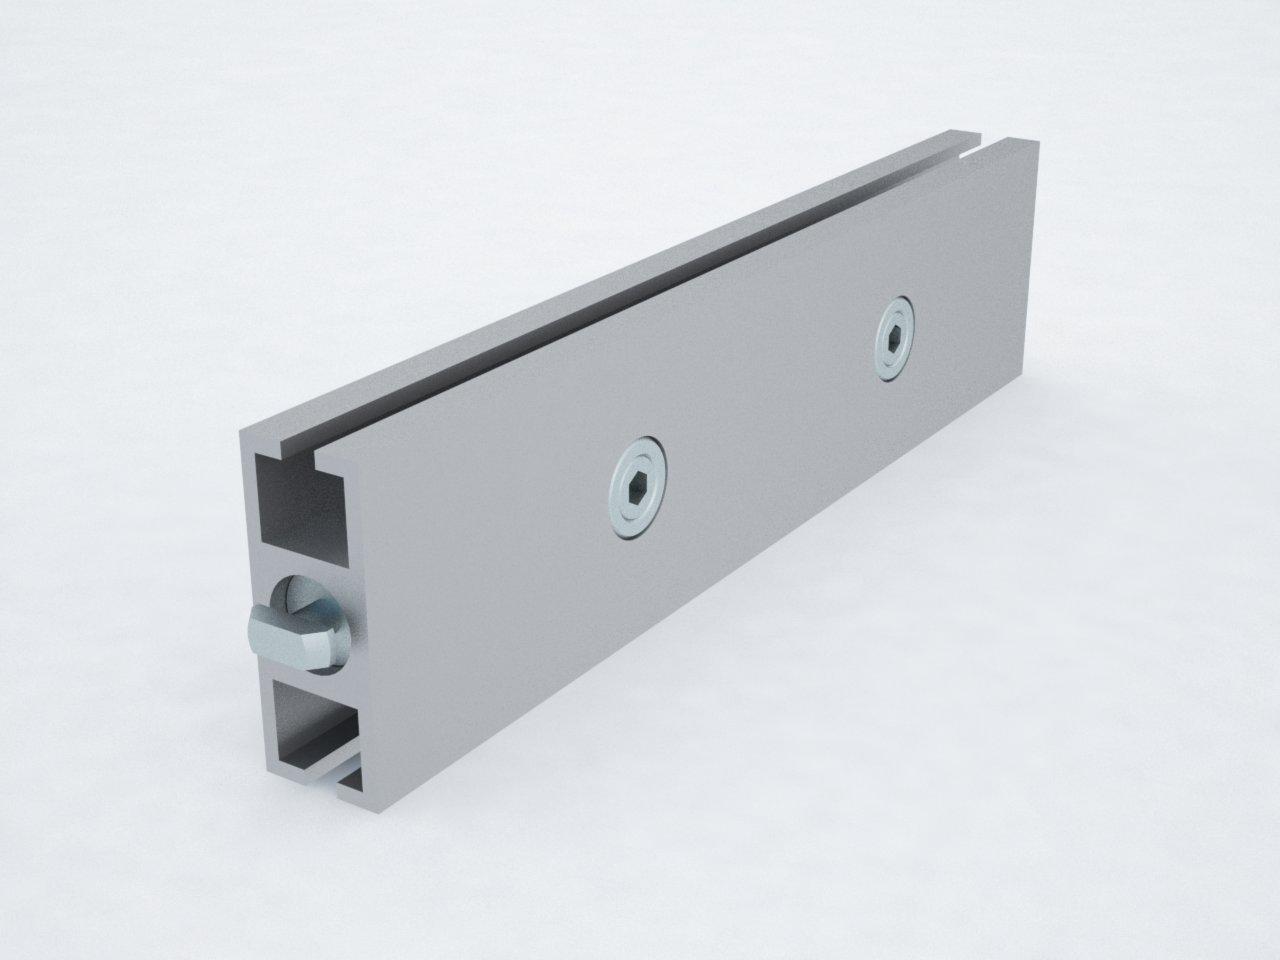 T400 40mm perfil travessa alumínio montagem stands estruturas octanorm